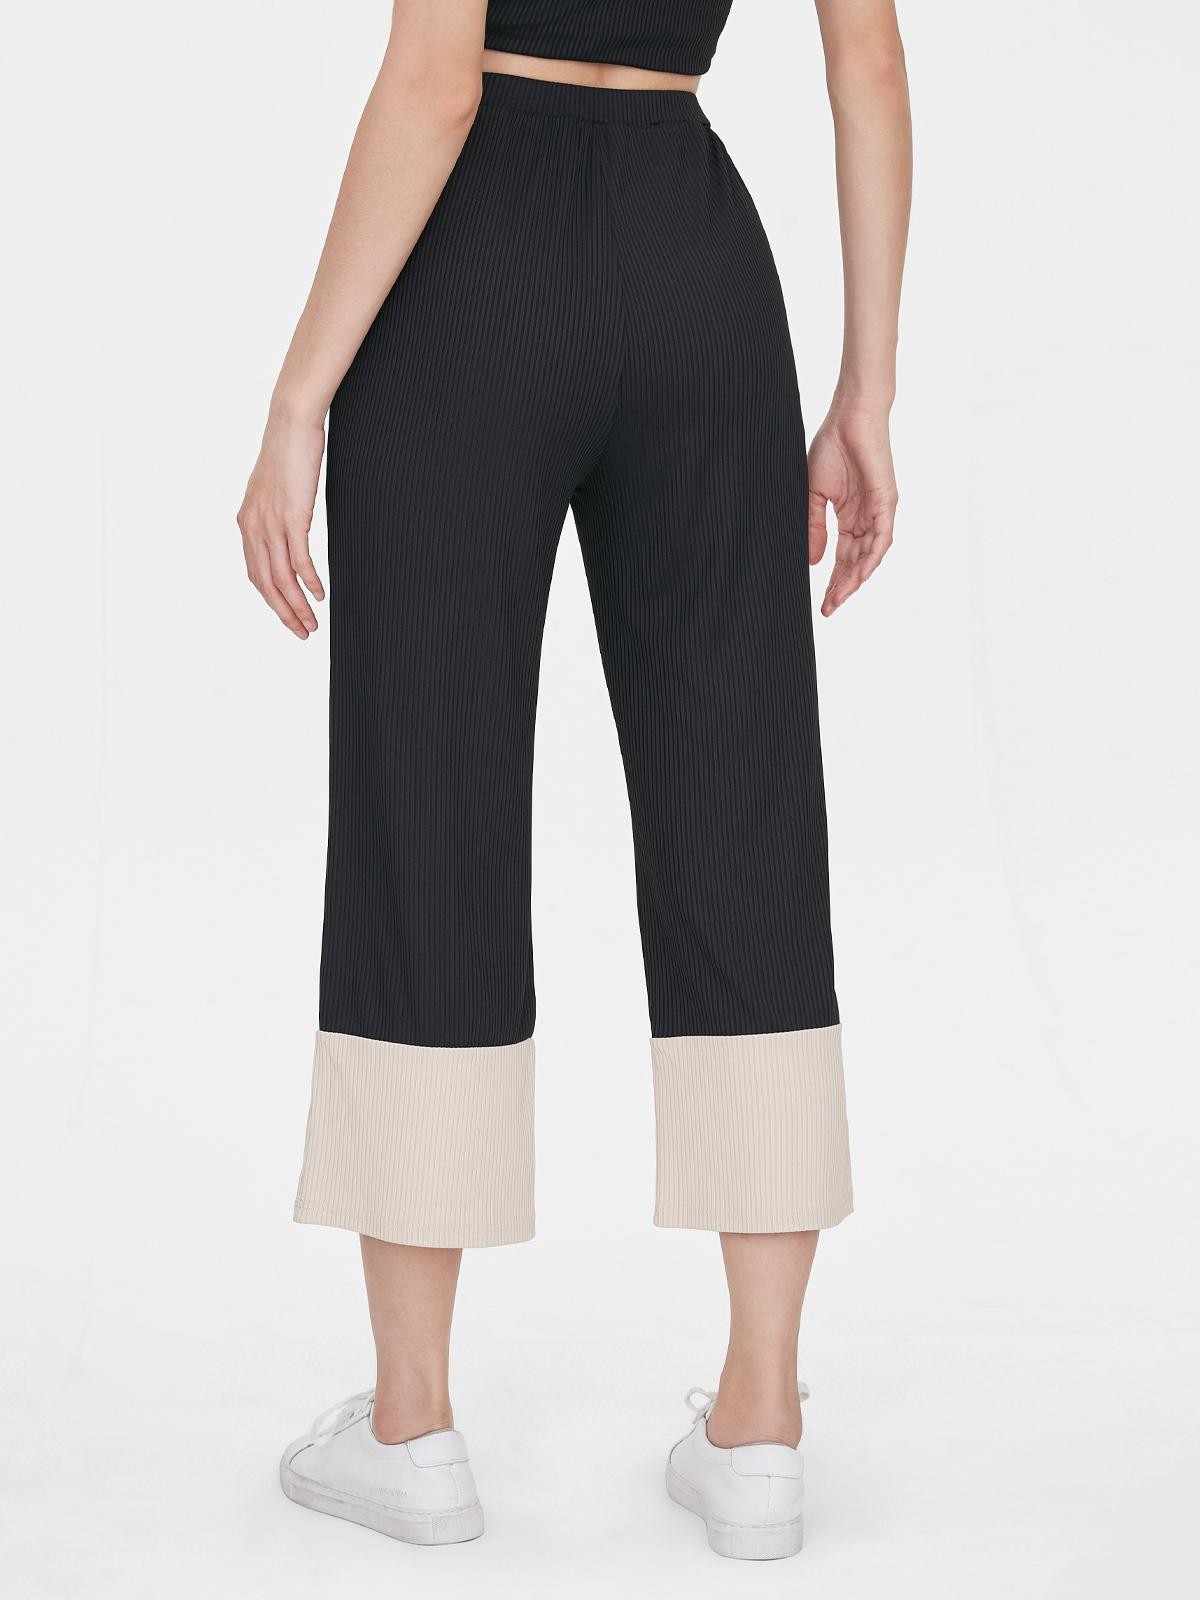 Two Tone Flared Pants Black